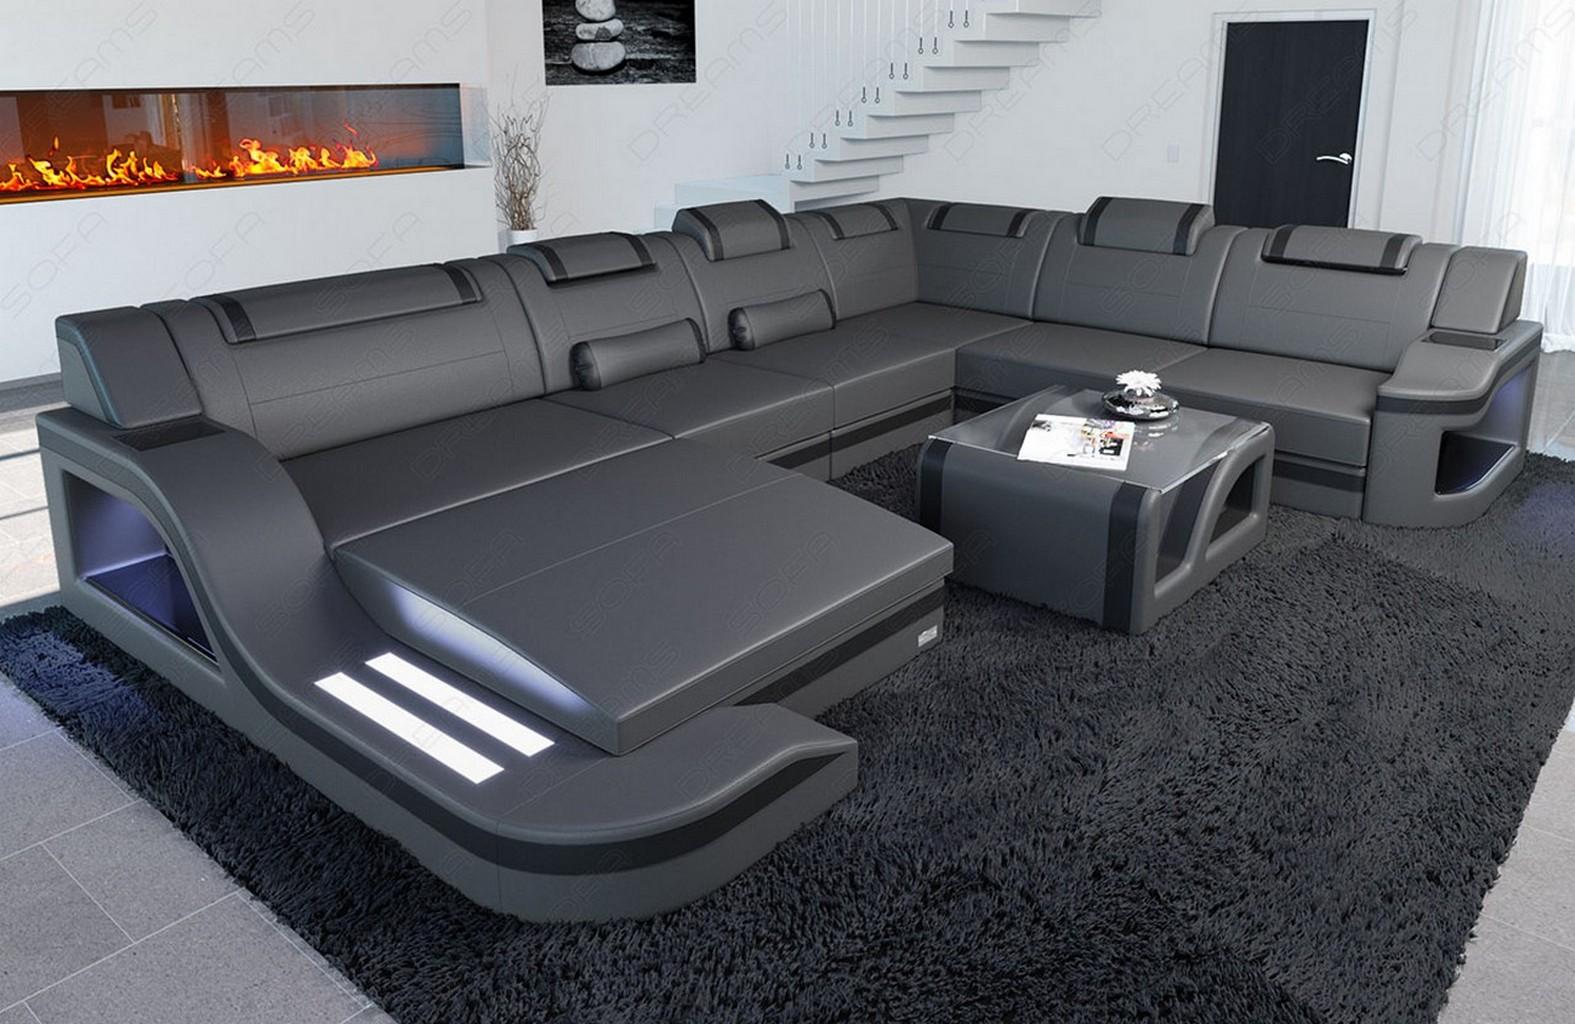 interior design leather palermo xxl with led lighting. Black Bedroom Furniture Sets. Home Design Ideas